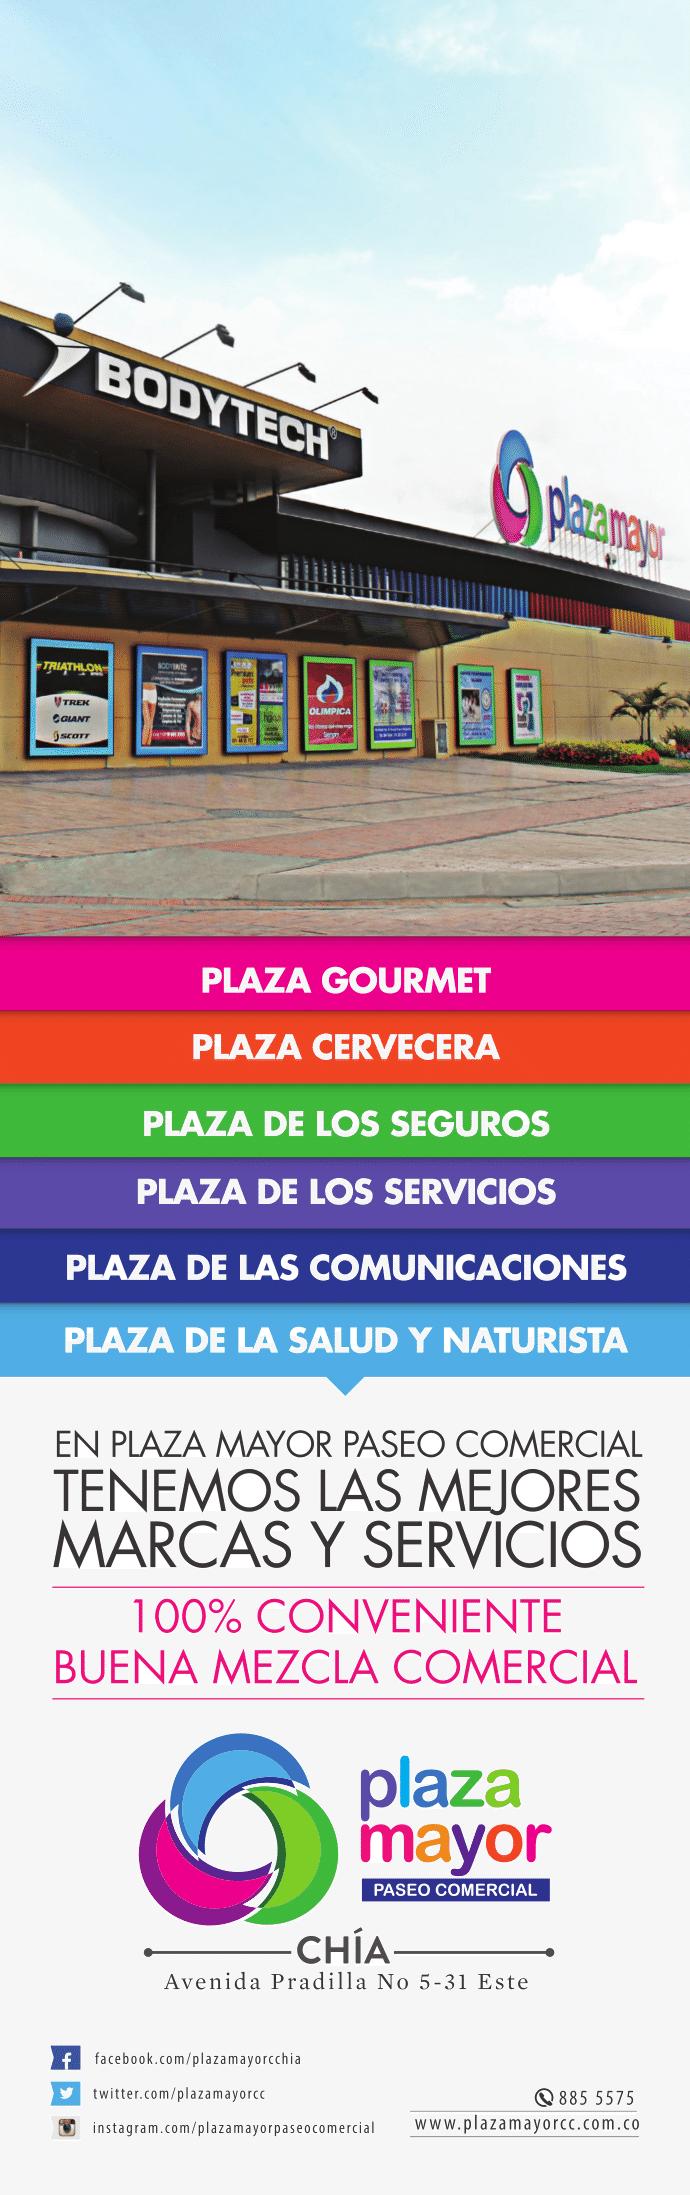 Plaza Mayor Paseo Comercial - Chía